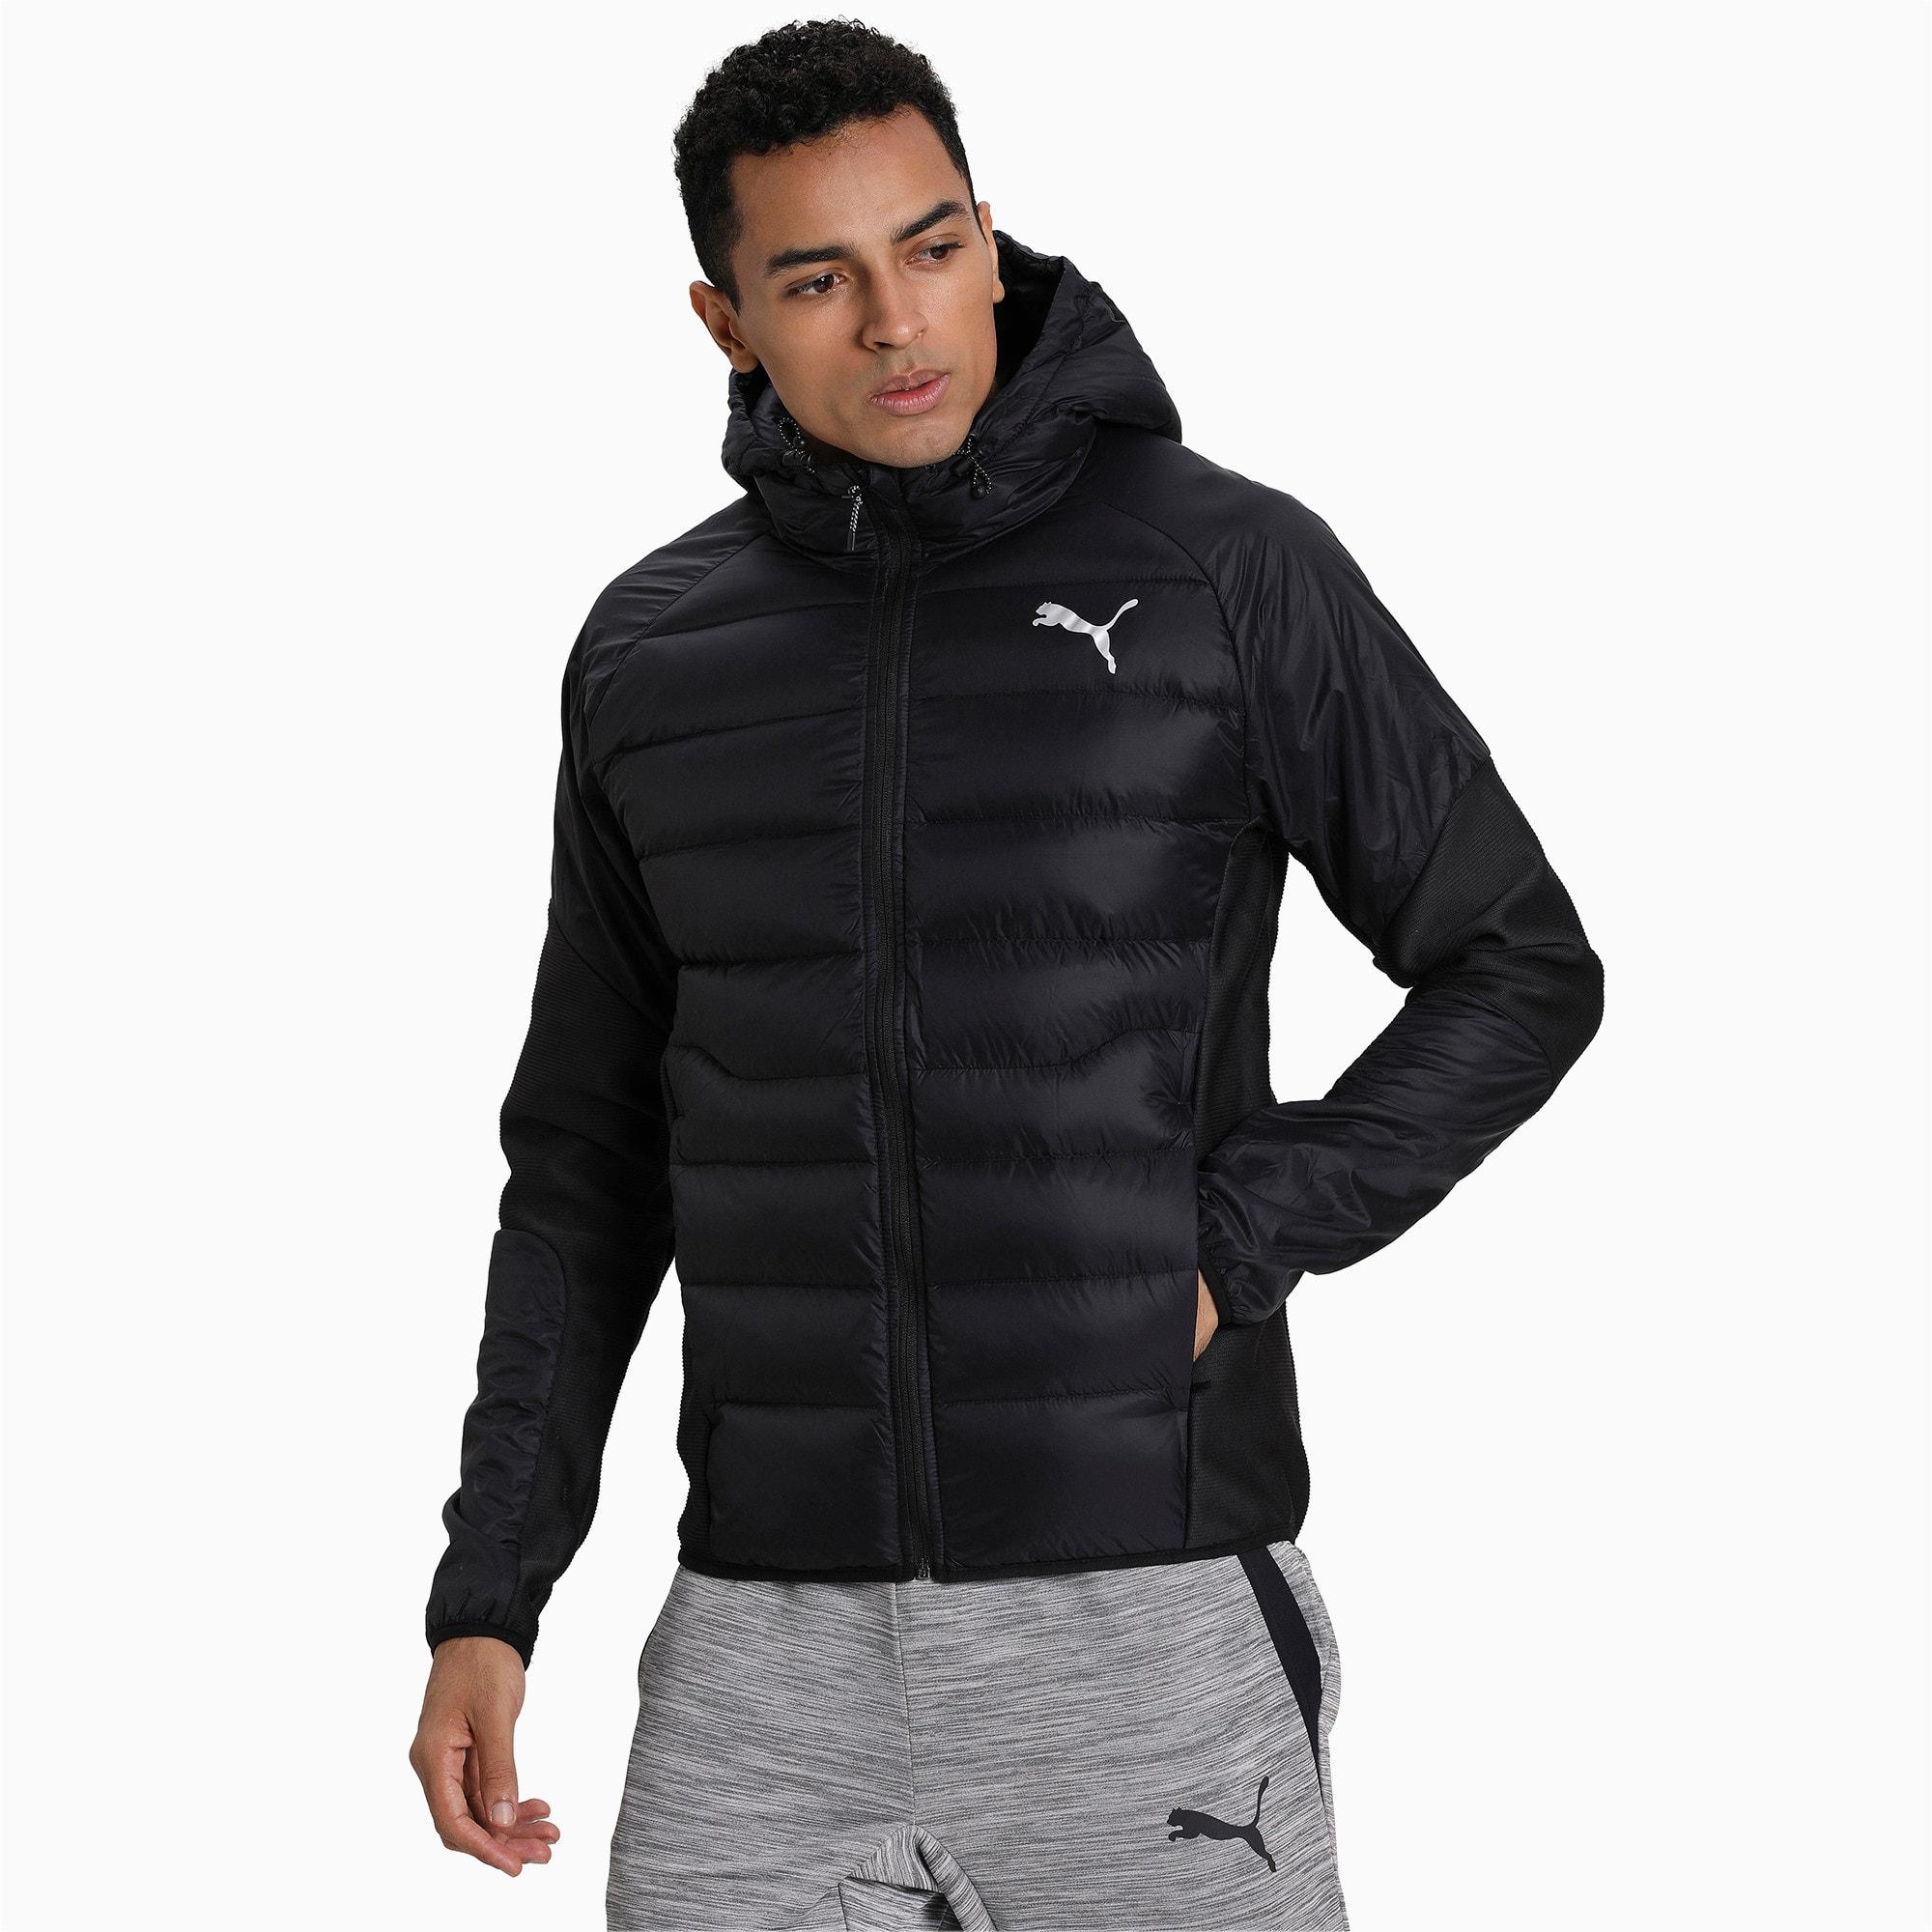 Thumbnail 1 of 600 Hybrid Down Men's Jacket, Puma Black, medium-IND